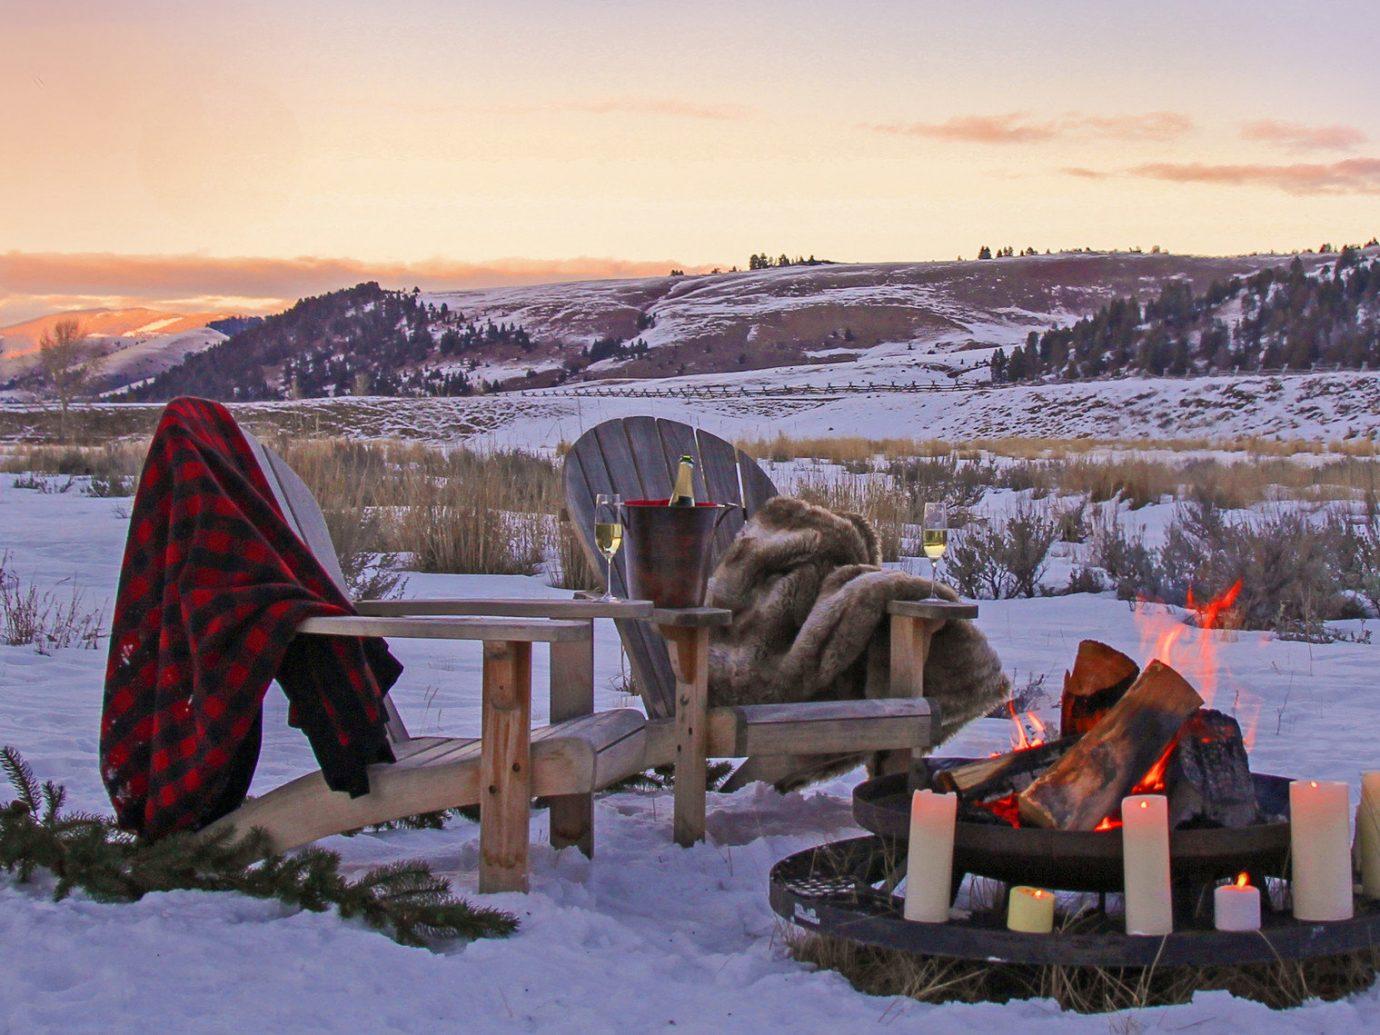 adirondack chairs blankets dusk fire Firepit flame Health + Wellness Hotels Spa Retreats sunrise Sunset Trip Ideas wilderness sky outdoor snow Winter weather season mountain